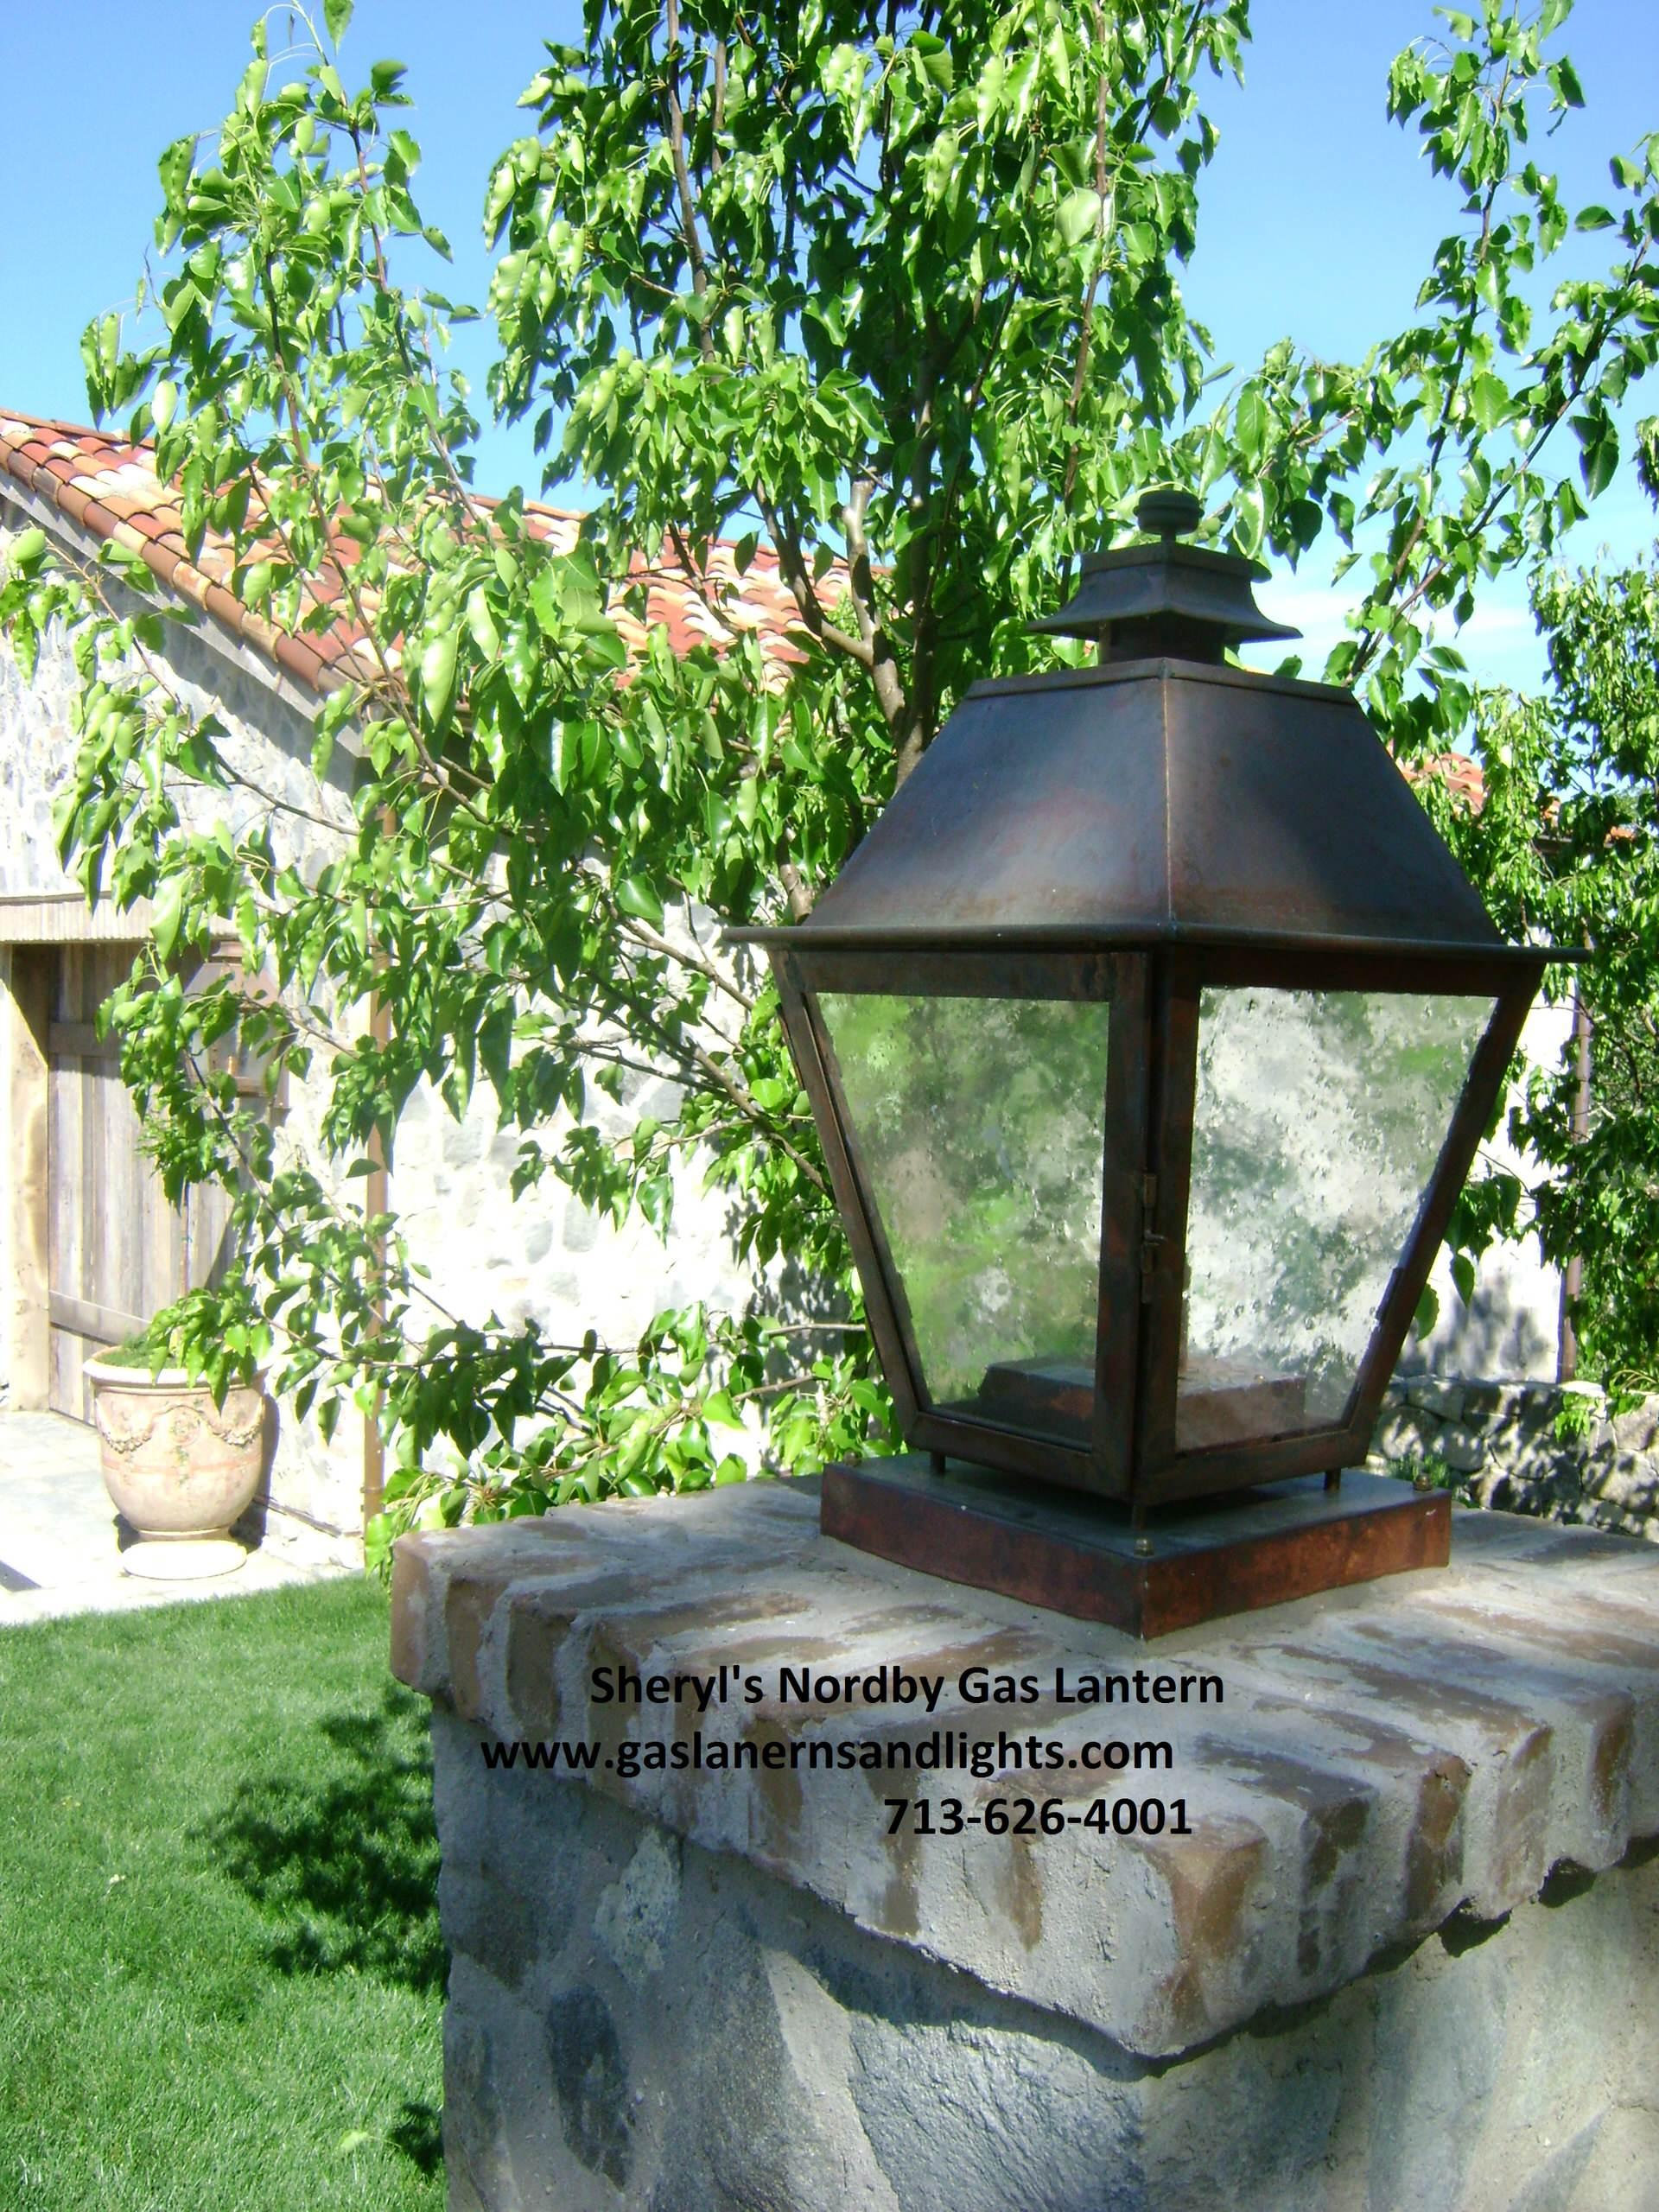 Sheryl's Nordby Gas Lantern